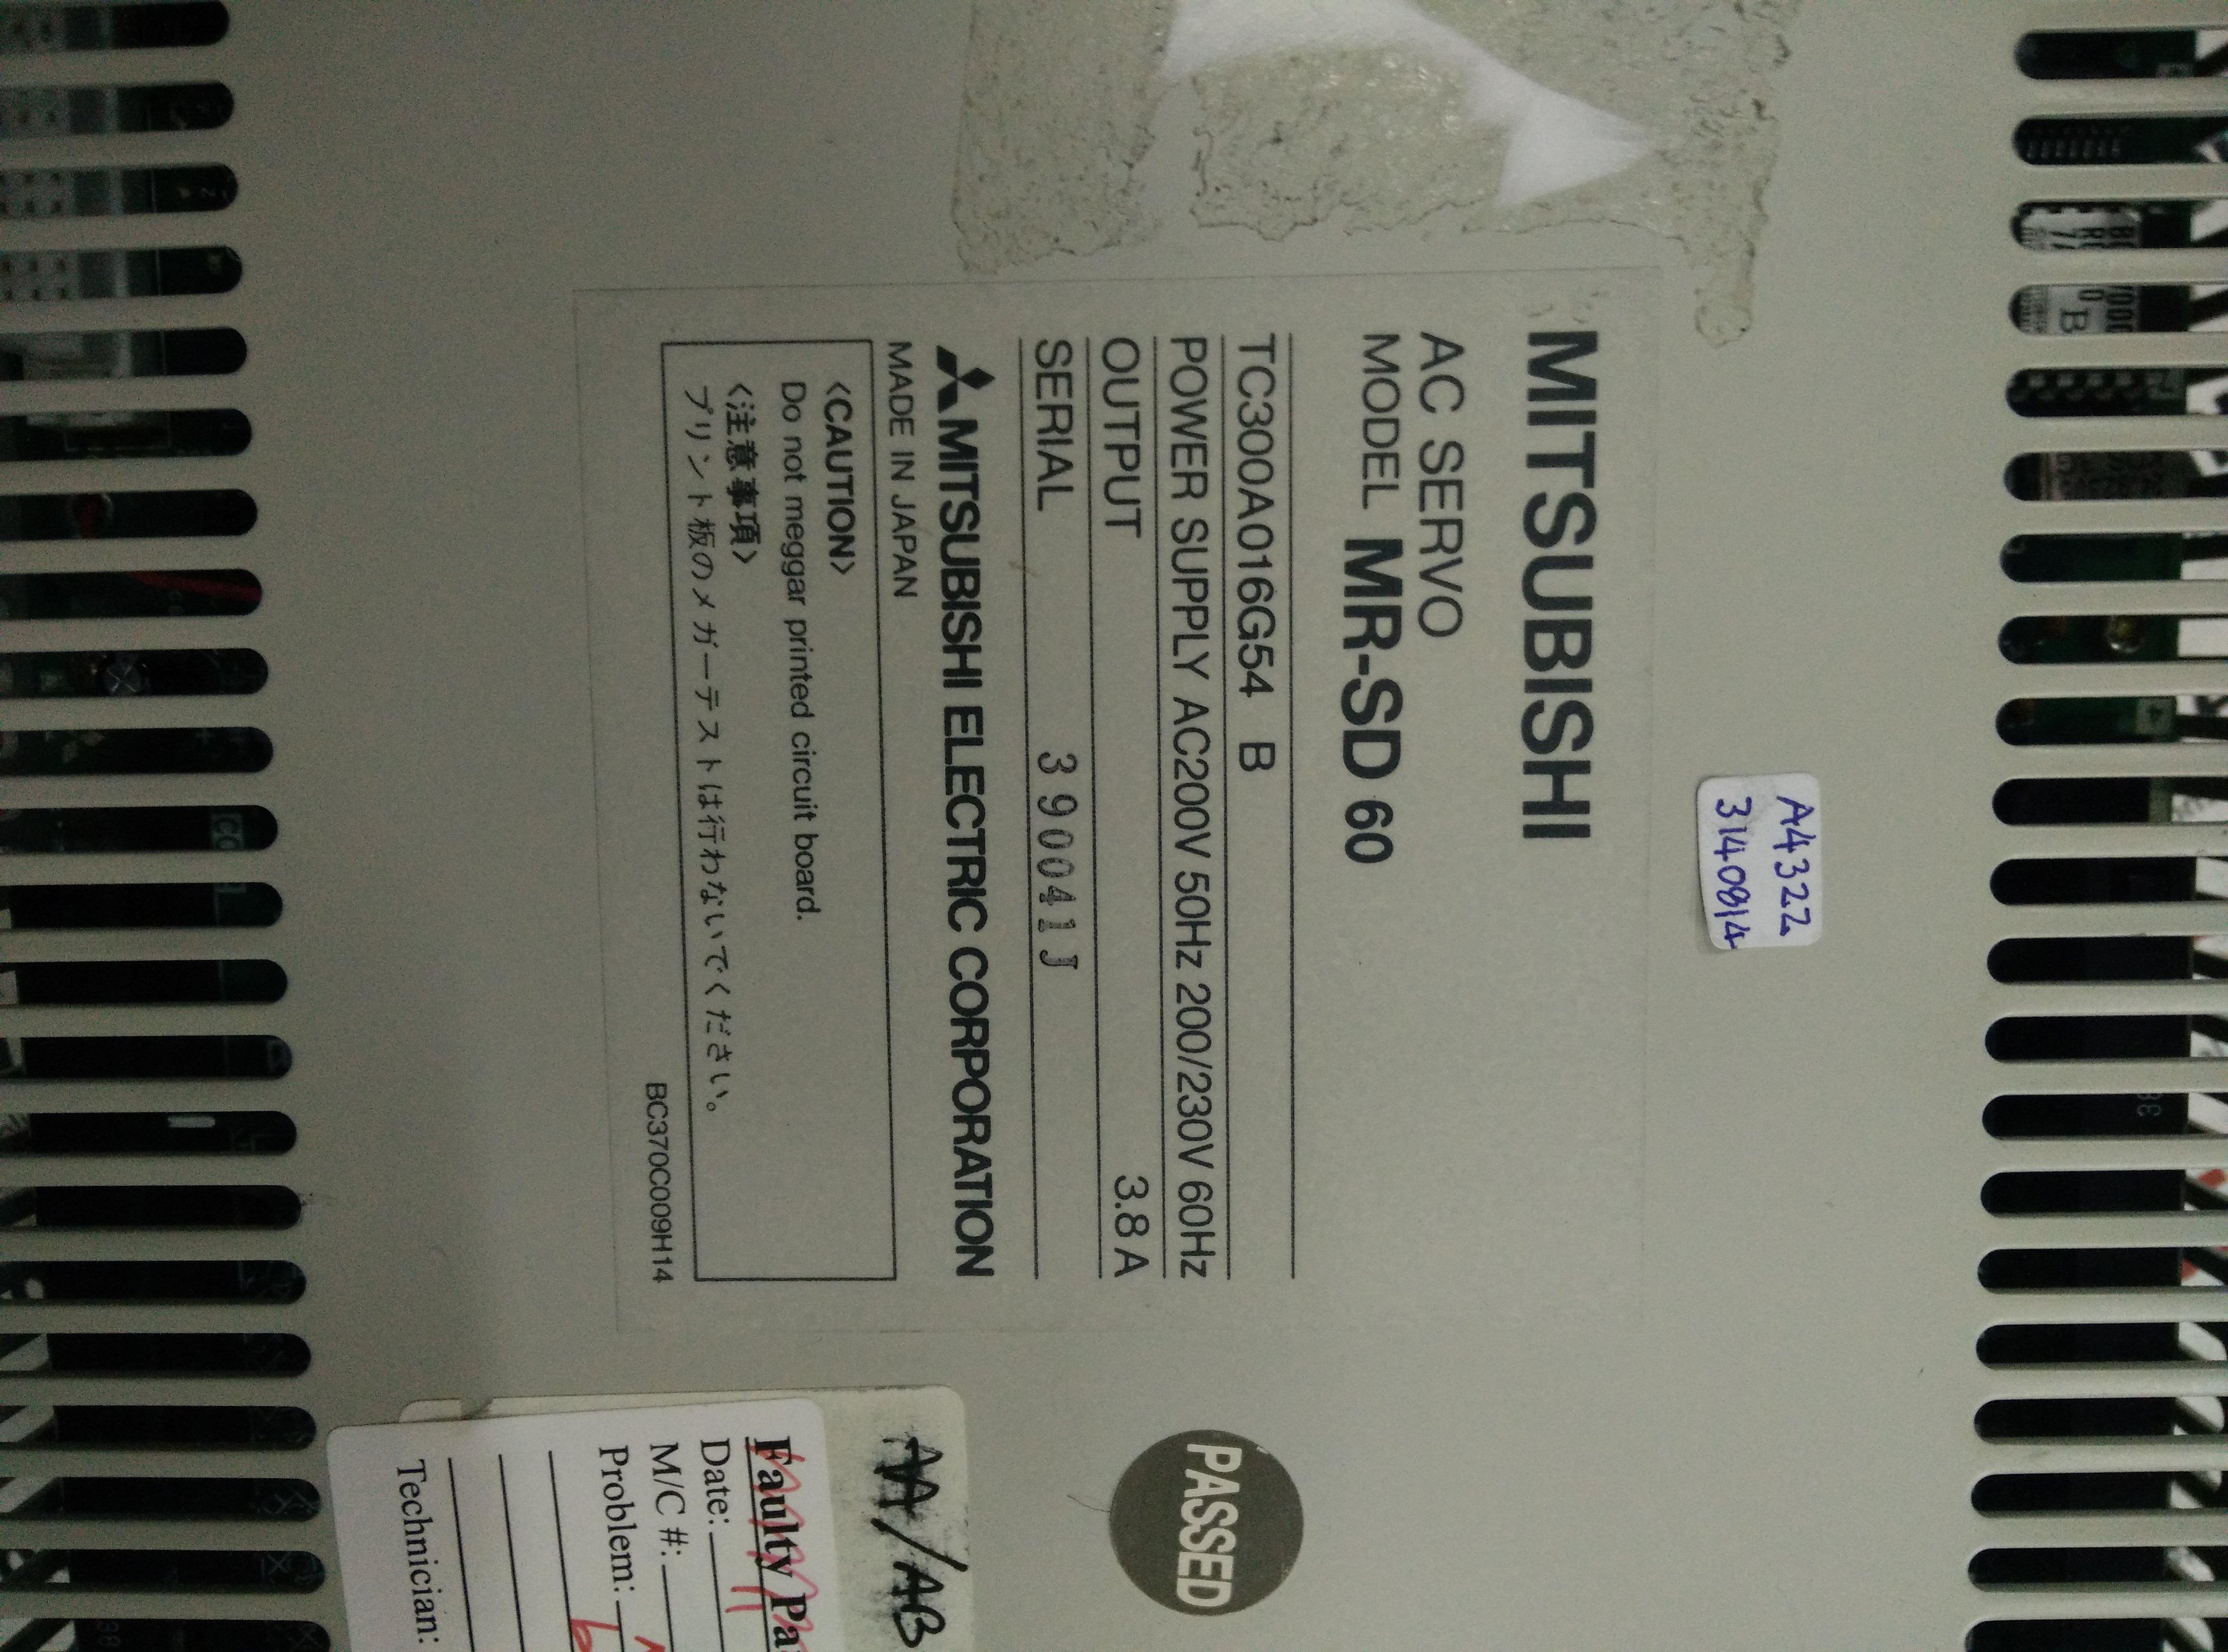 Repair MR-SD60 MITSUBISHI MITSUBISHI AC SERVO in Malaysia, Singapore, Thailand, Indonesia